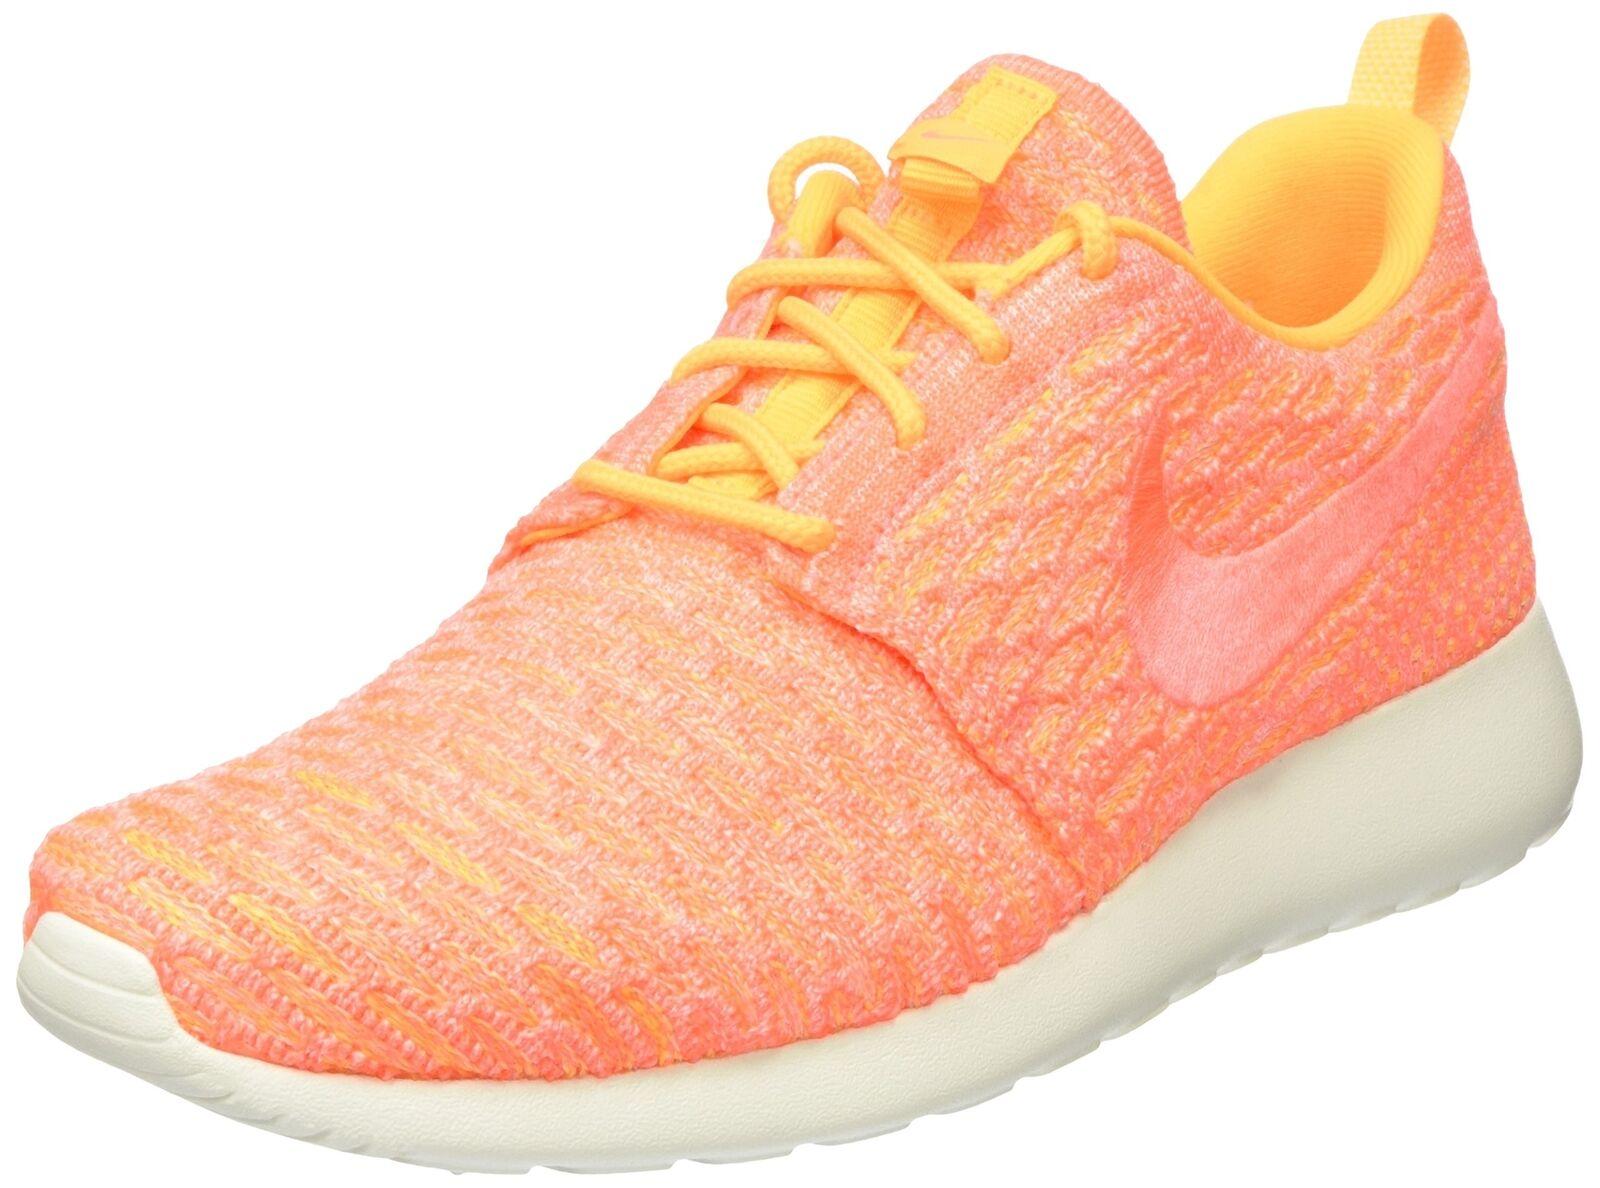 Nike Women's Roshe One Flyknit Laser Orange/Bright Mango/Sail Running Shoe 9....